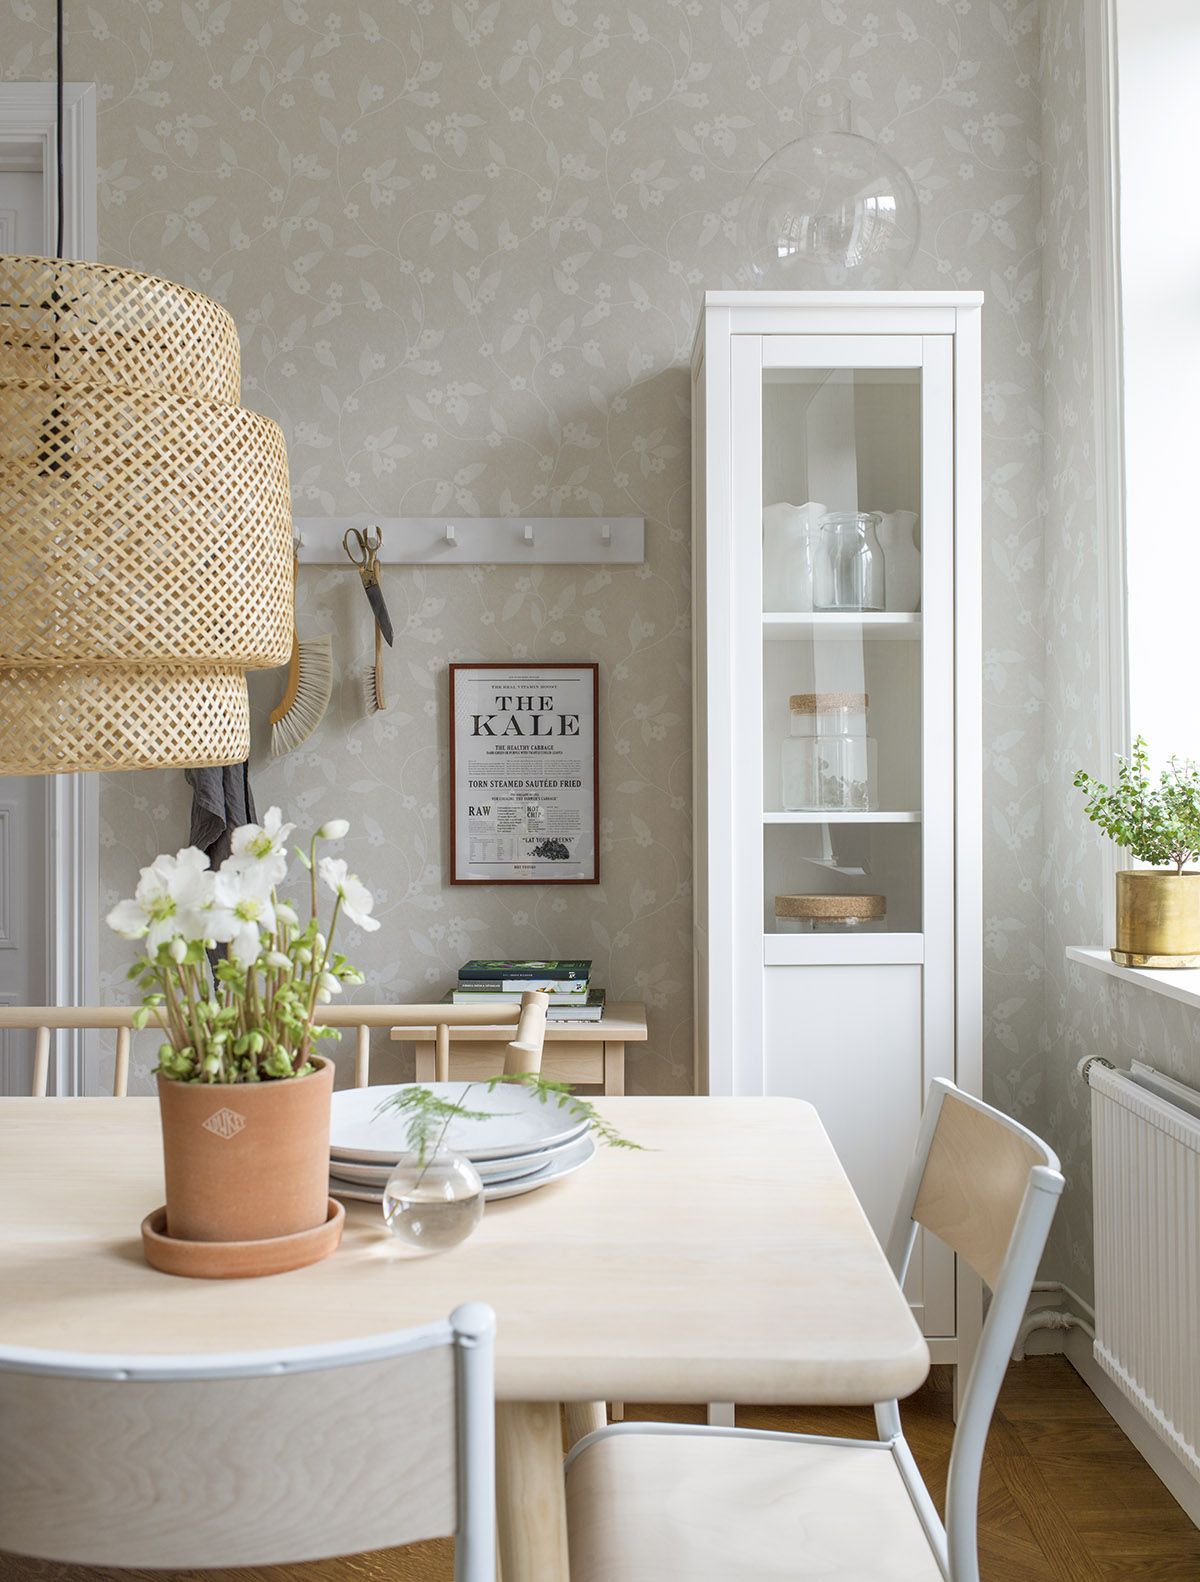 Decorama EASY UP 16 - Eco Wallpaper | Inspiration home | Pinterest ...